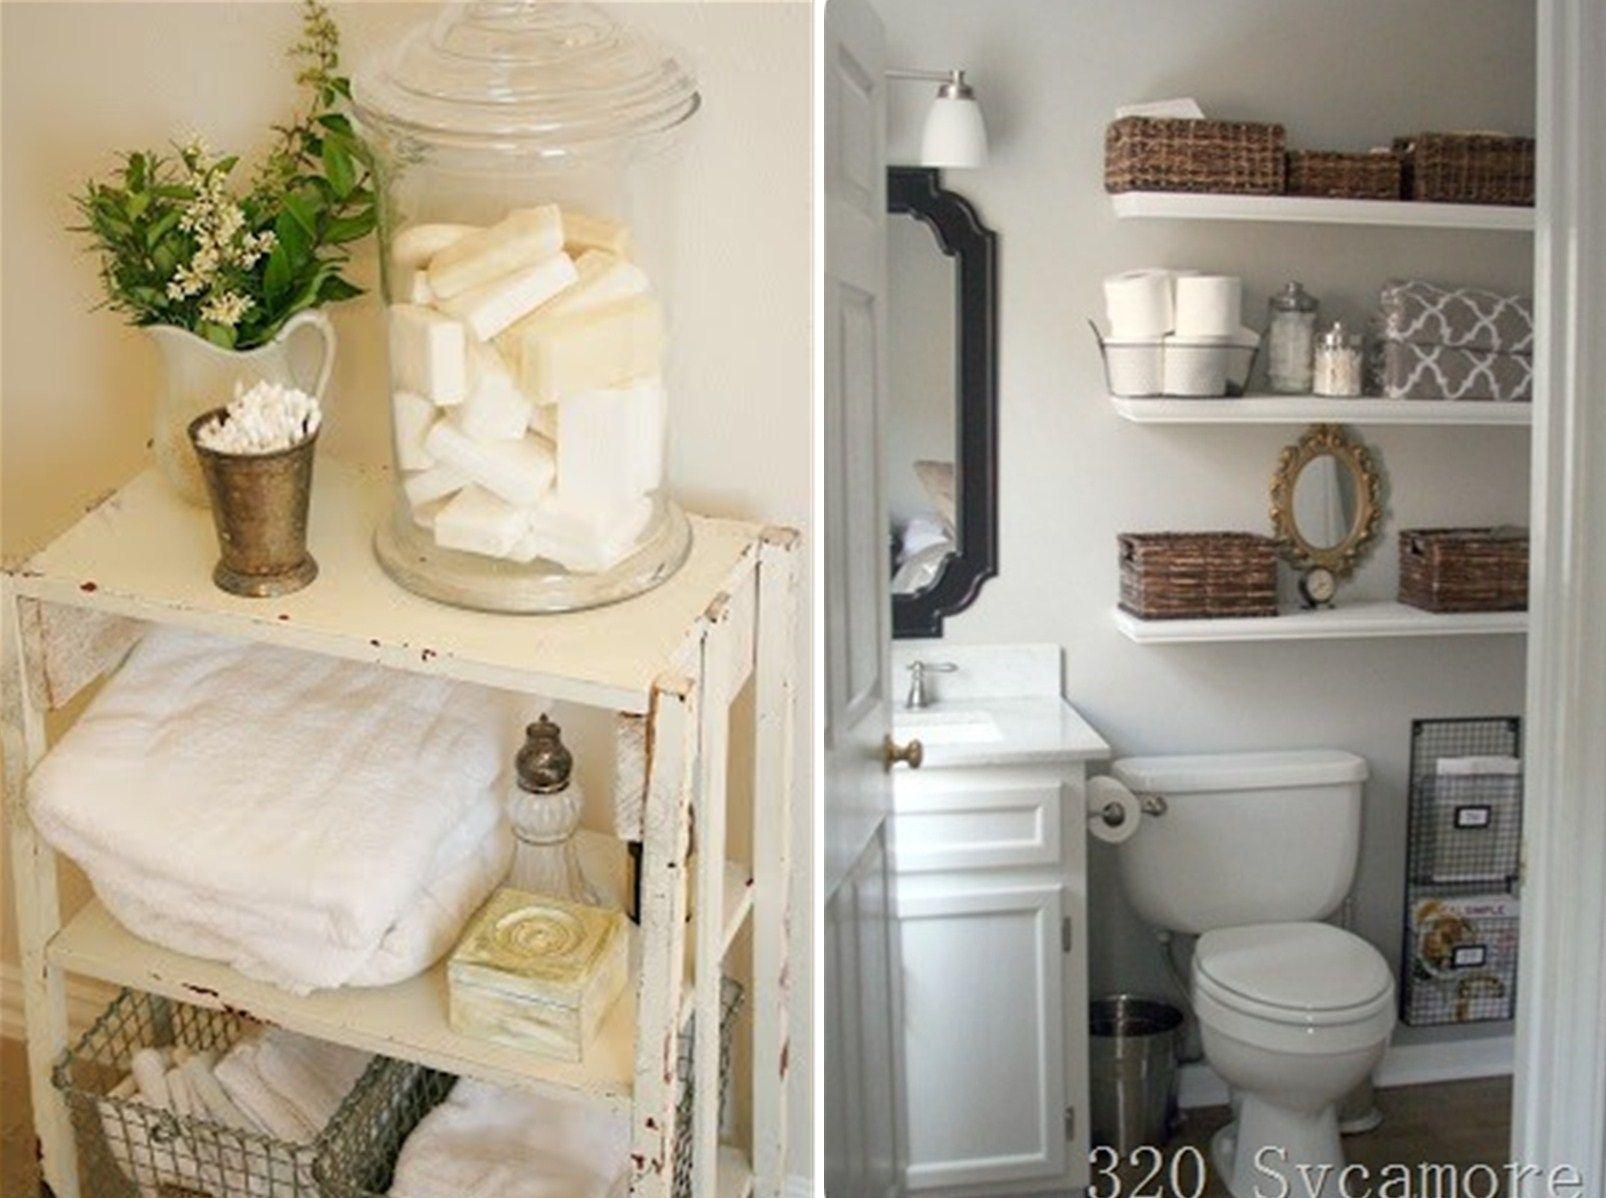 Bathroomorganizationideasapartmentbathroomideasgirlsbedroom Amazing Creative Small Bathroom Ideas Design Inspiration